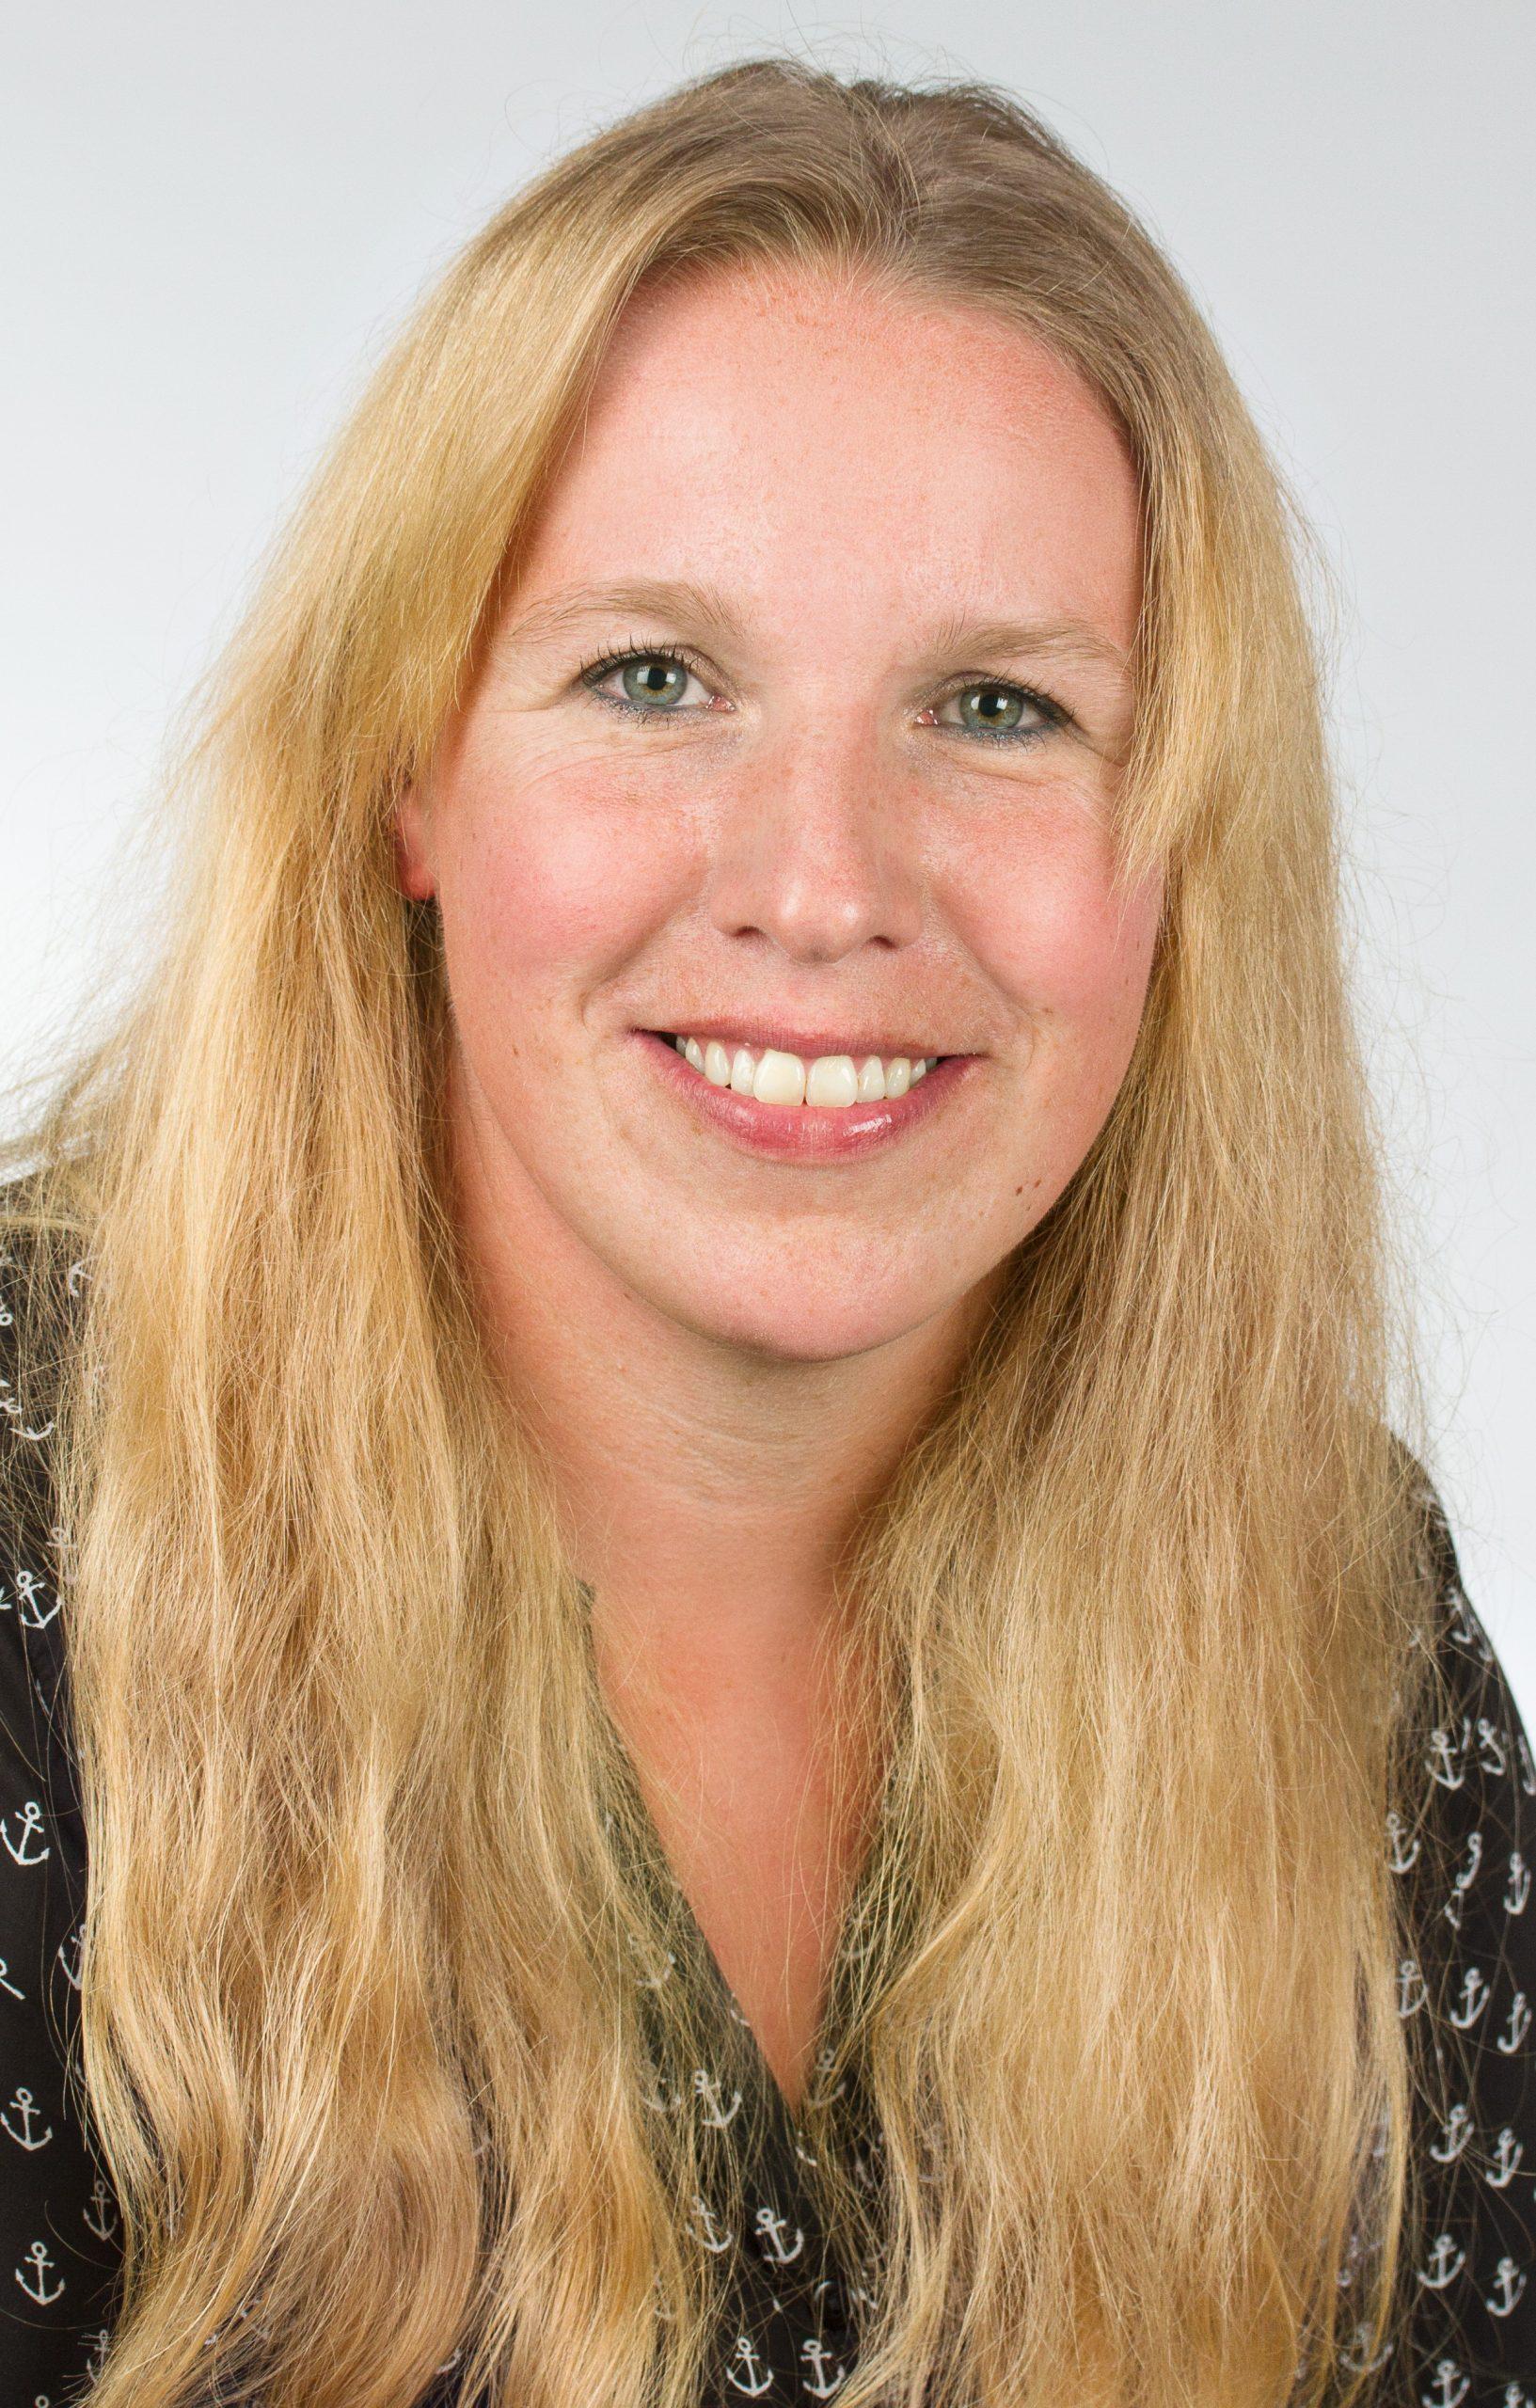 Hospiz Salzgitter - Schwester Sabrina